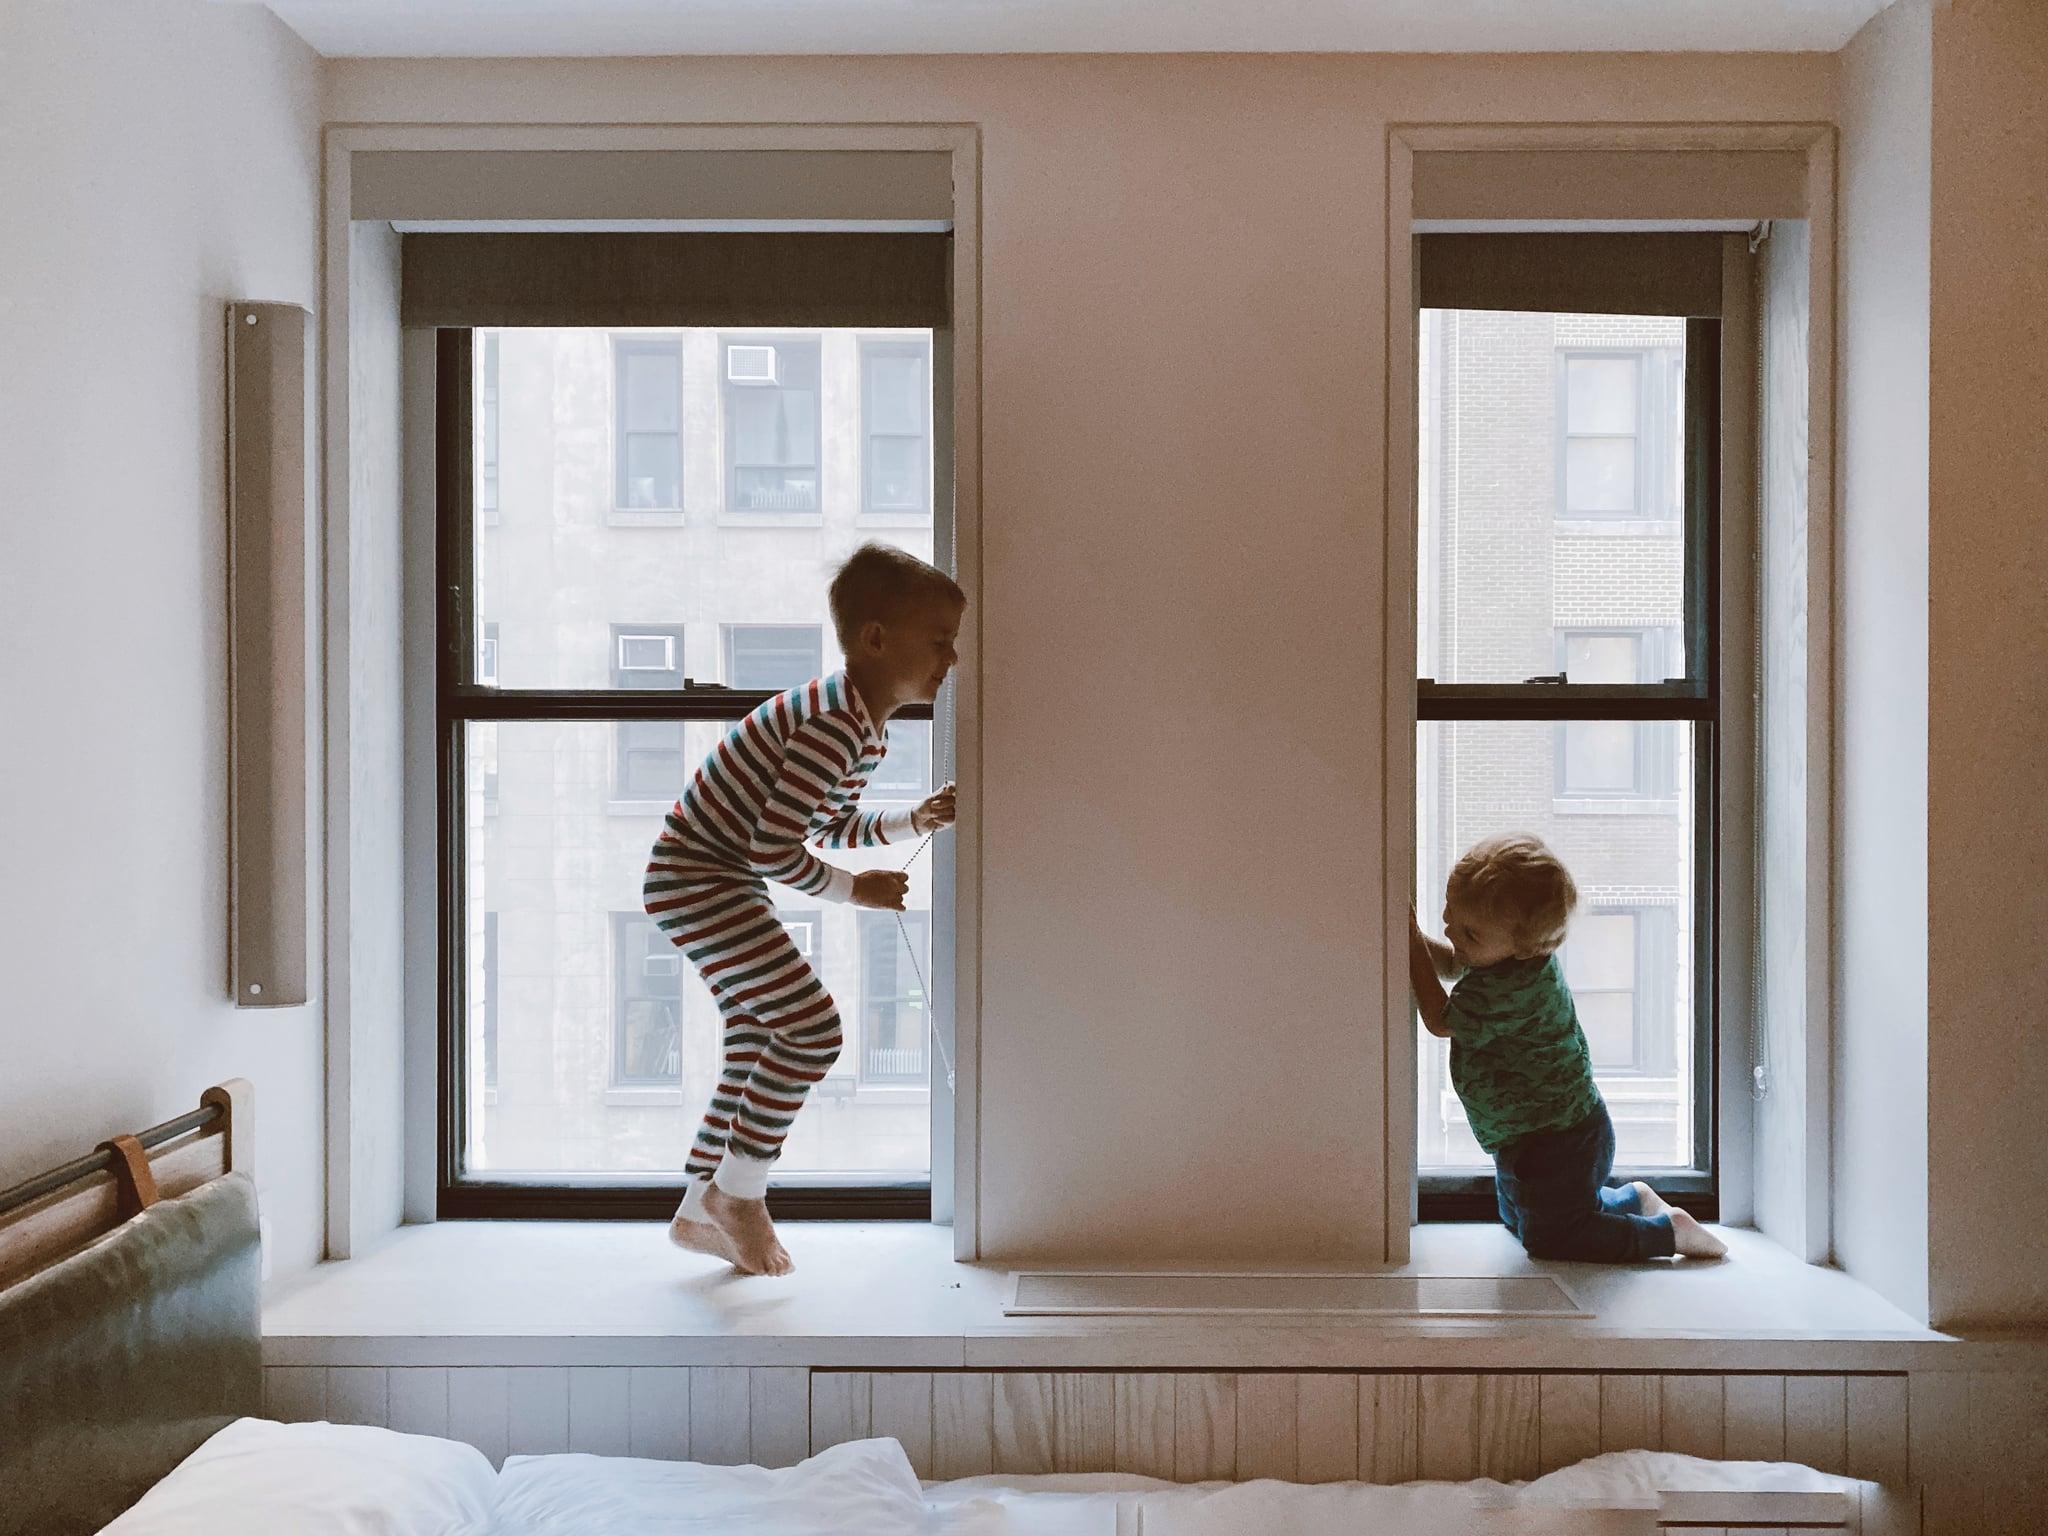 tmp_mBeS9g_2777e8187628ed1a_two-kids-playing-beside-glass-windows-3273851.jpg